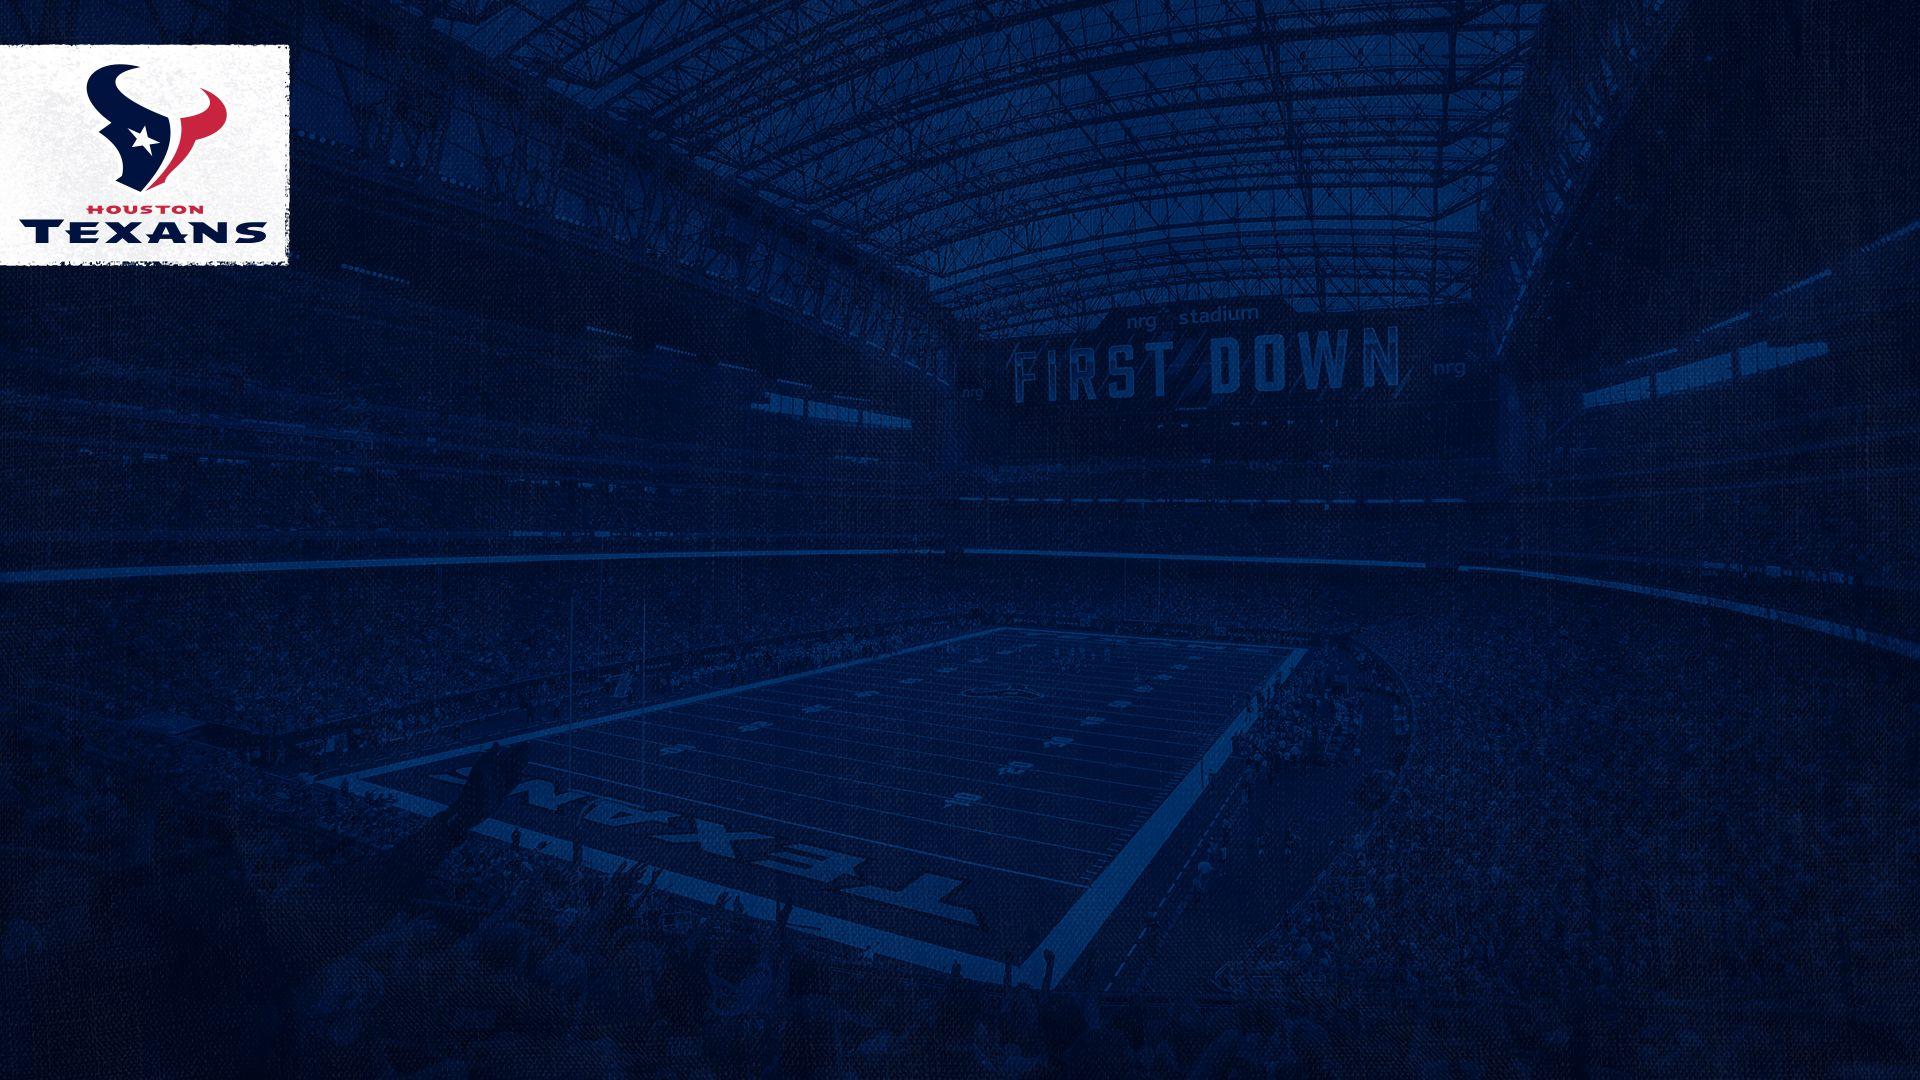 Zoom_Texans_1920x1080_Stadium_V1